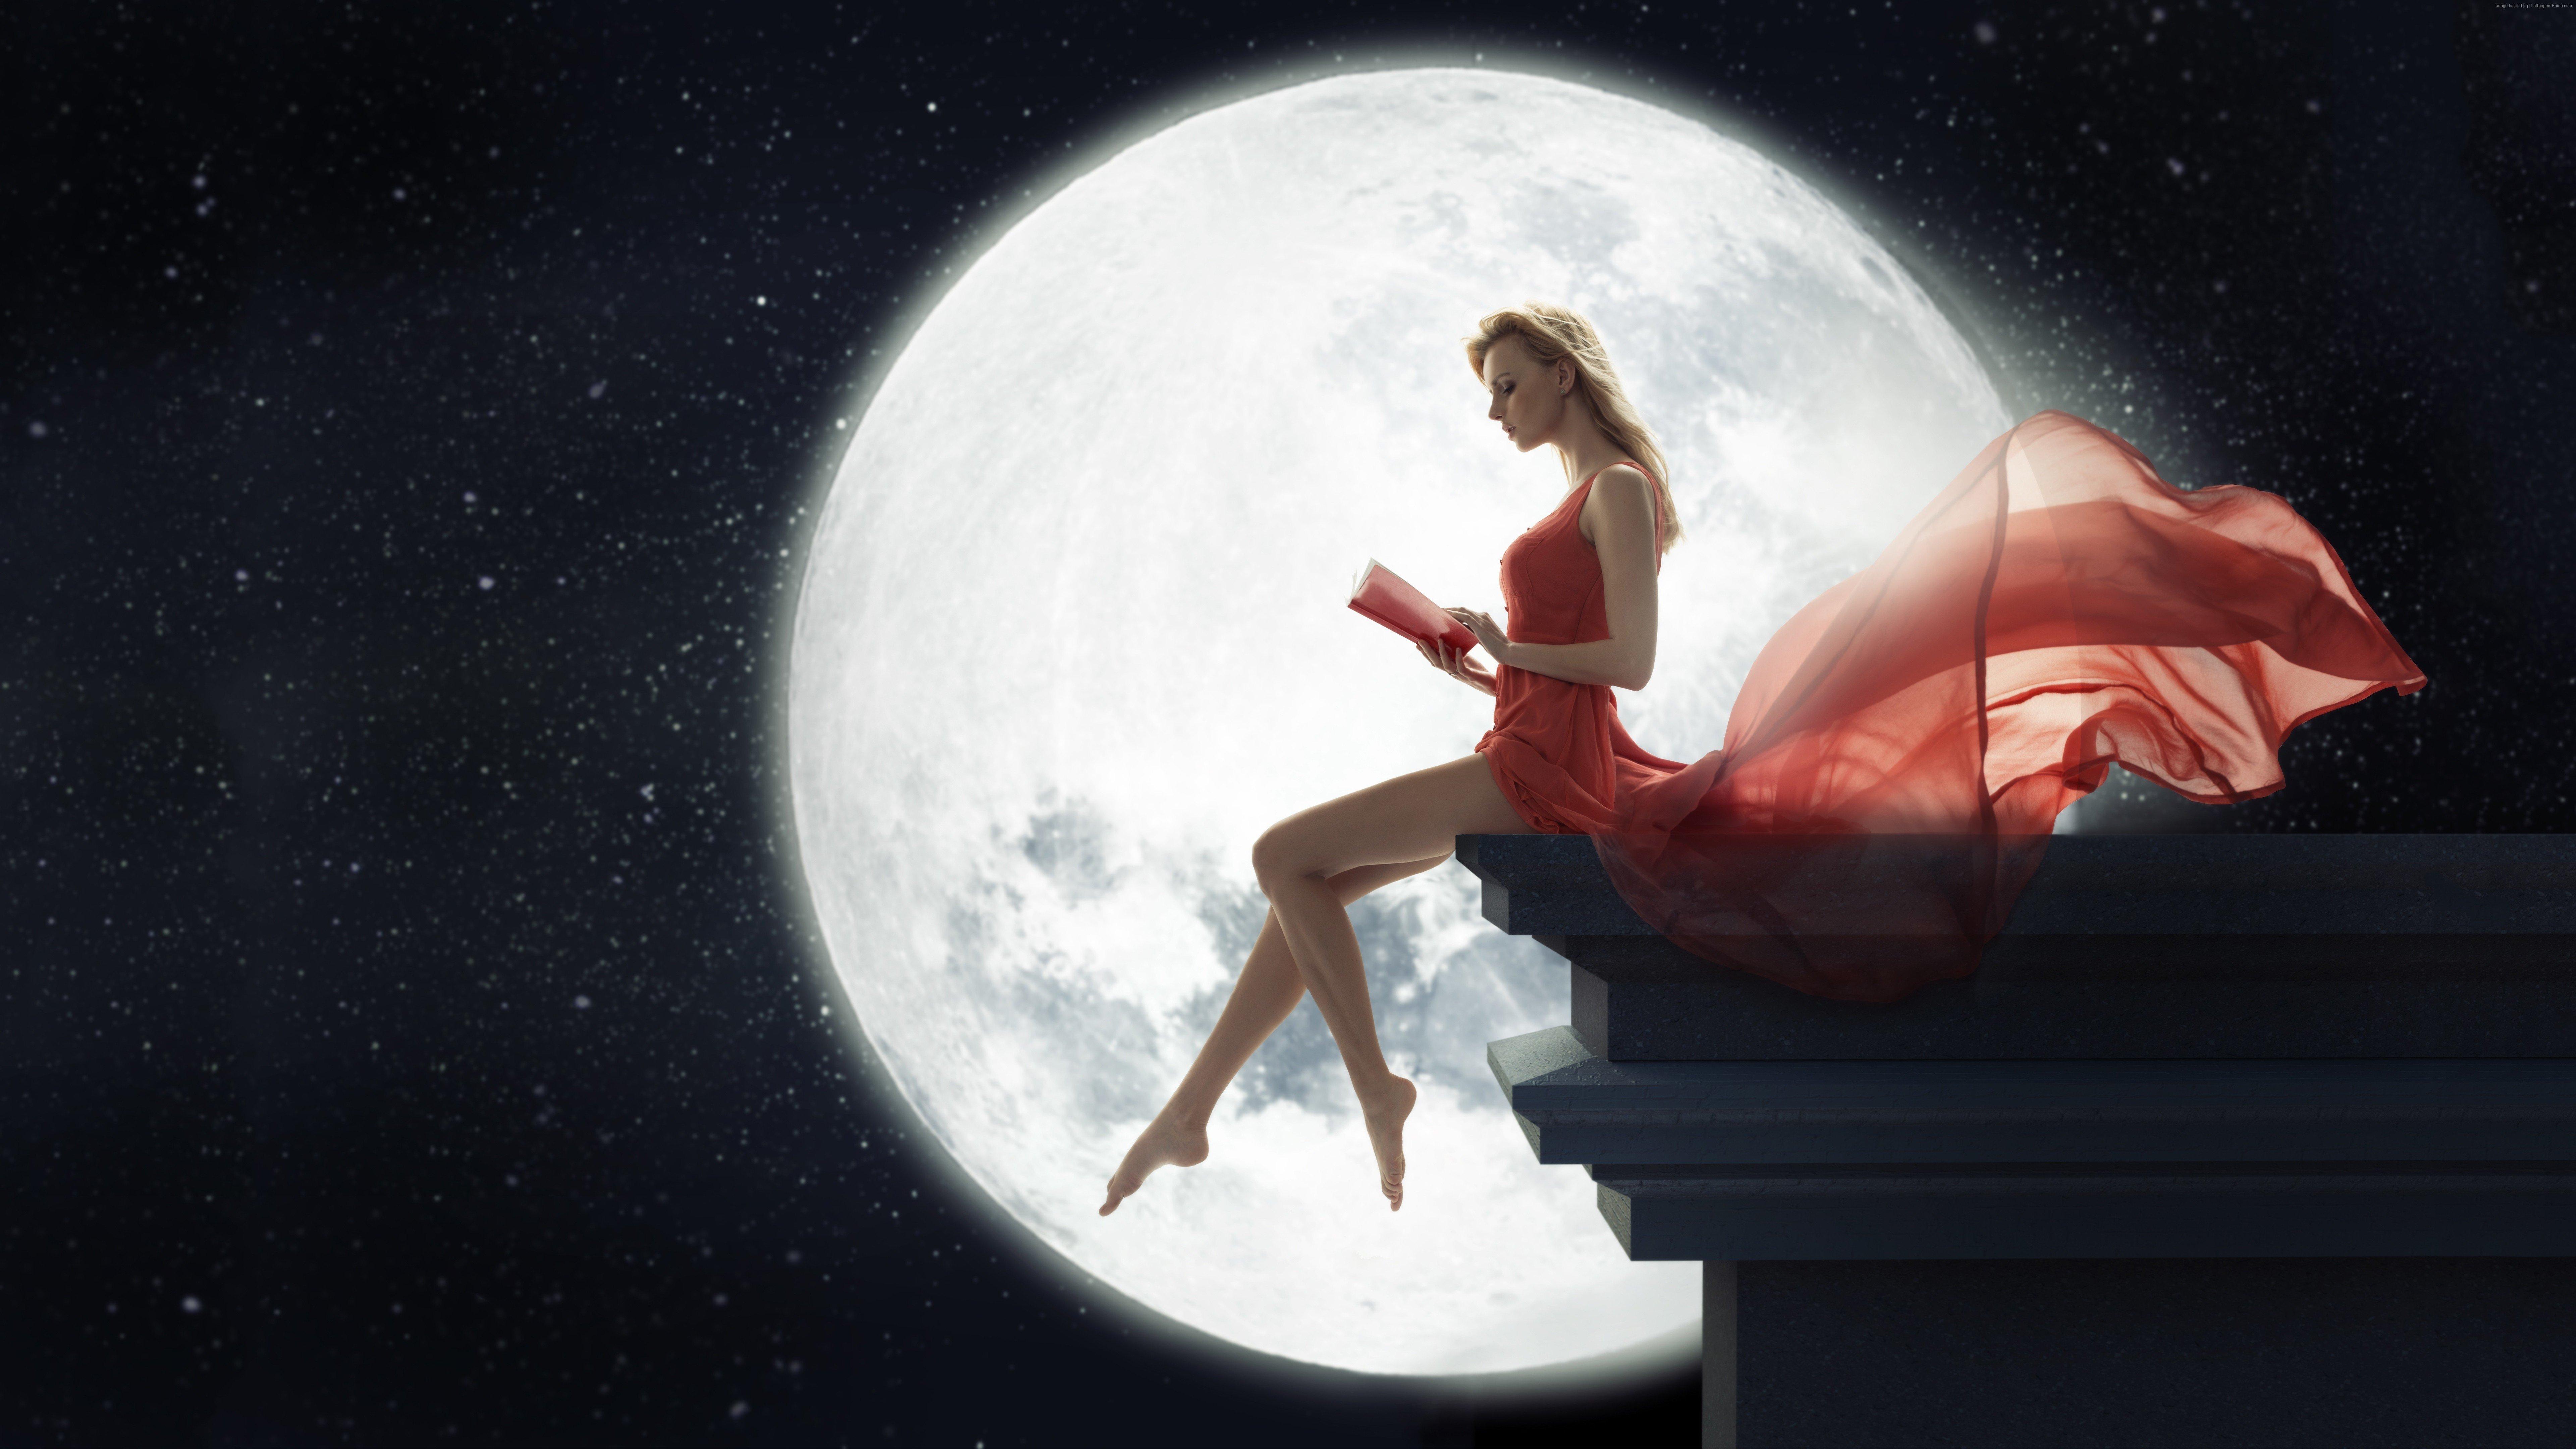 Fantasy Girl Sitting On Roof Reading Book Moon Hd Fantasy